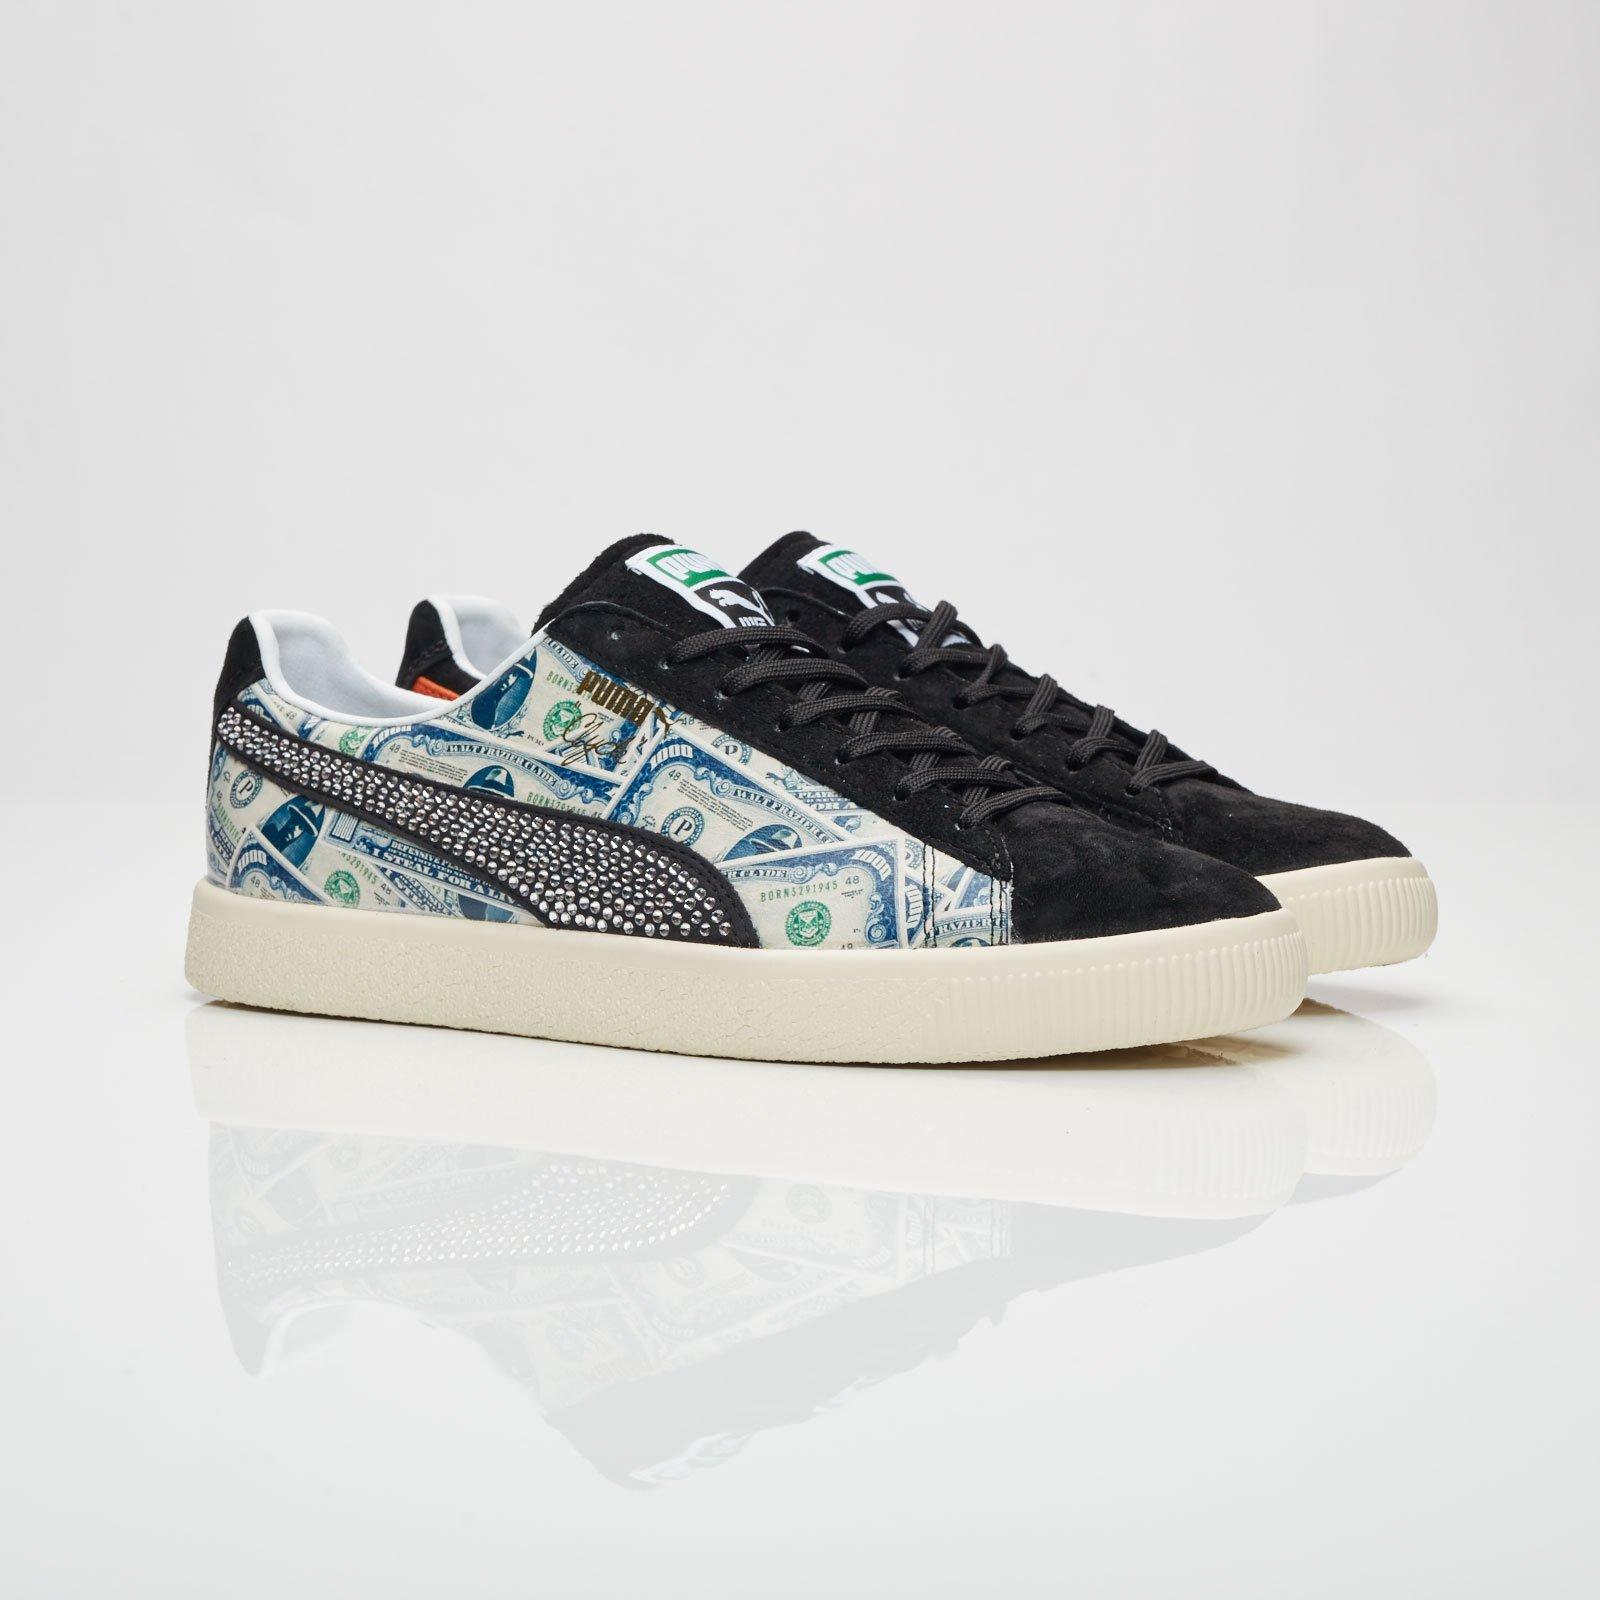 4b1fd33c3975 Puma Clyde X Mita - 364303-02 - Sneakersnstuff